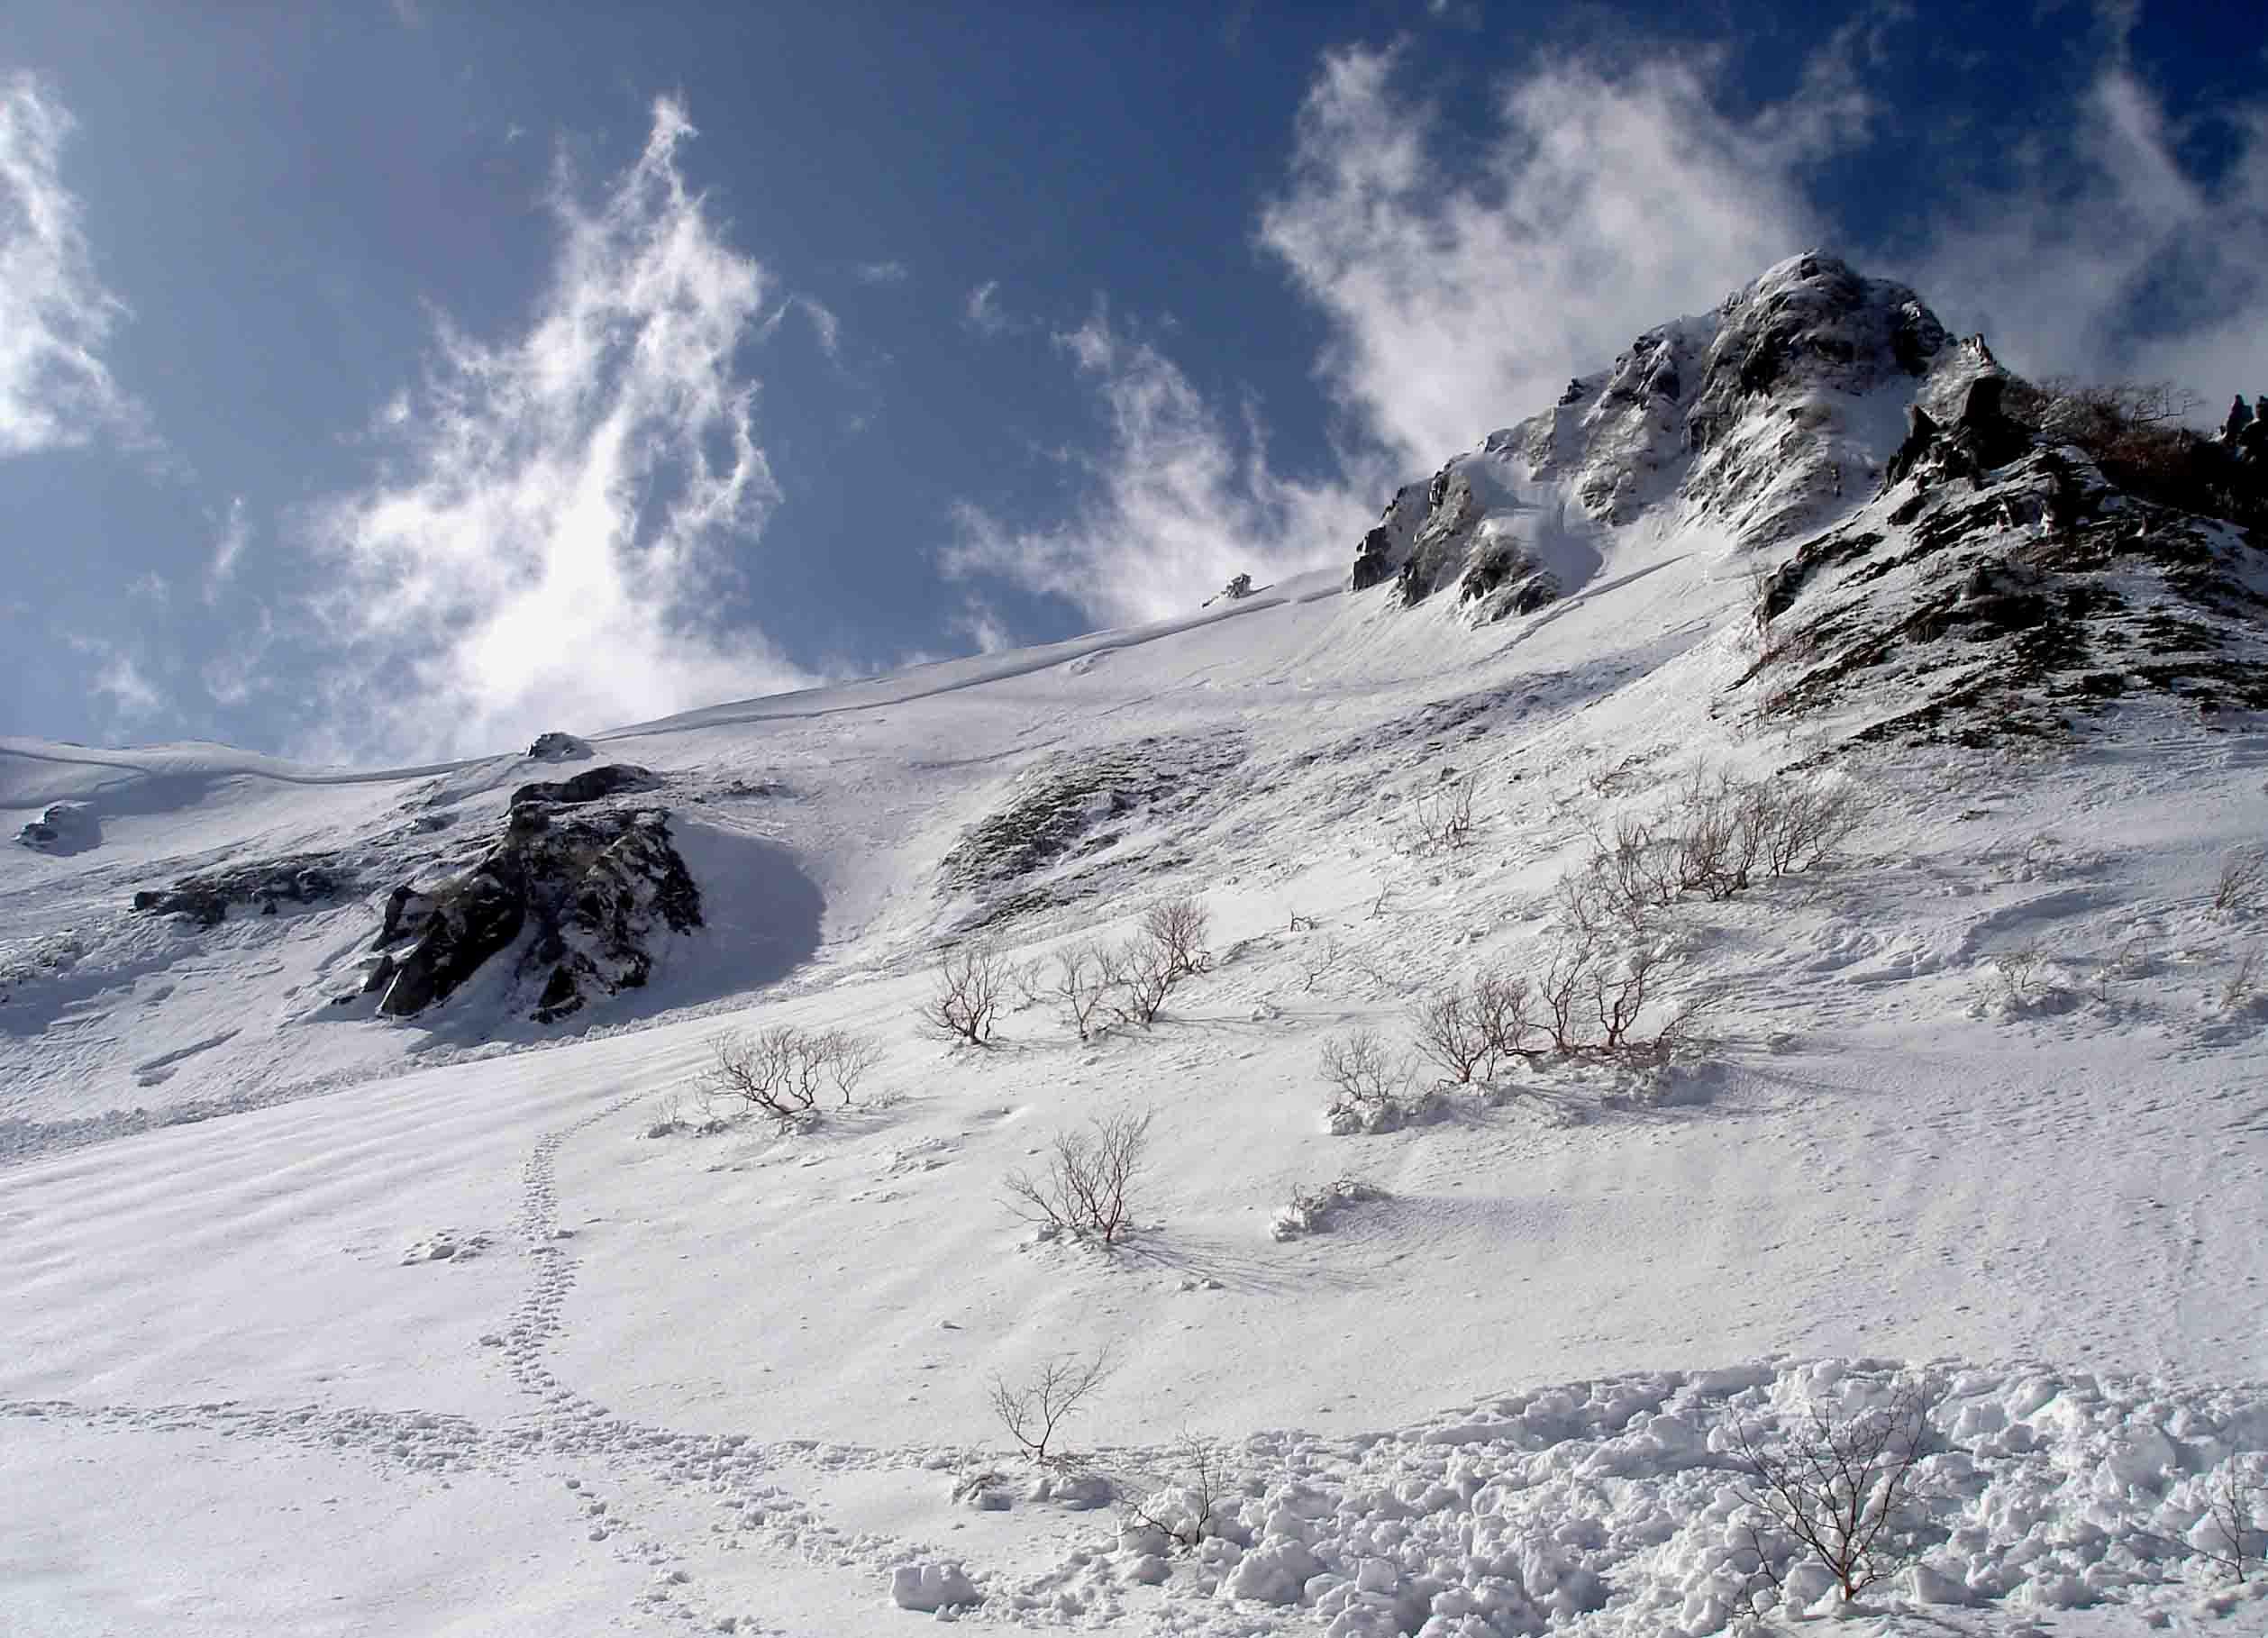 極楽平側の雪崩跡(破断面) DSC05681